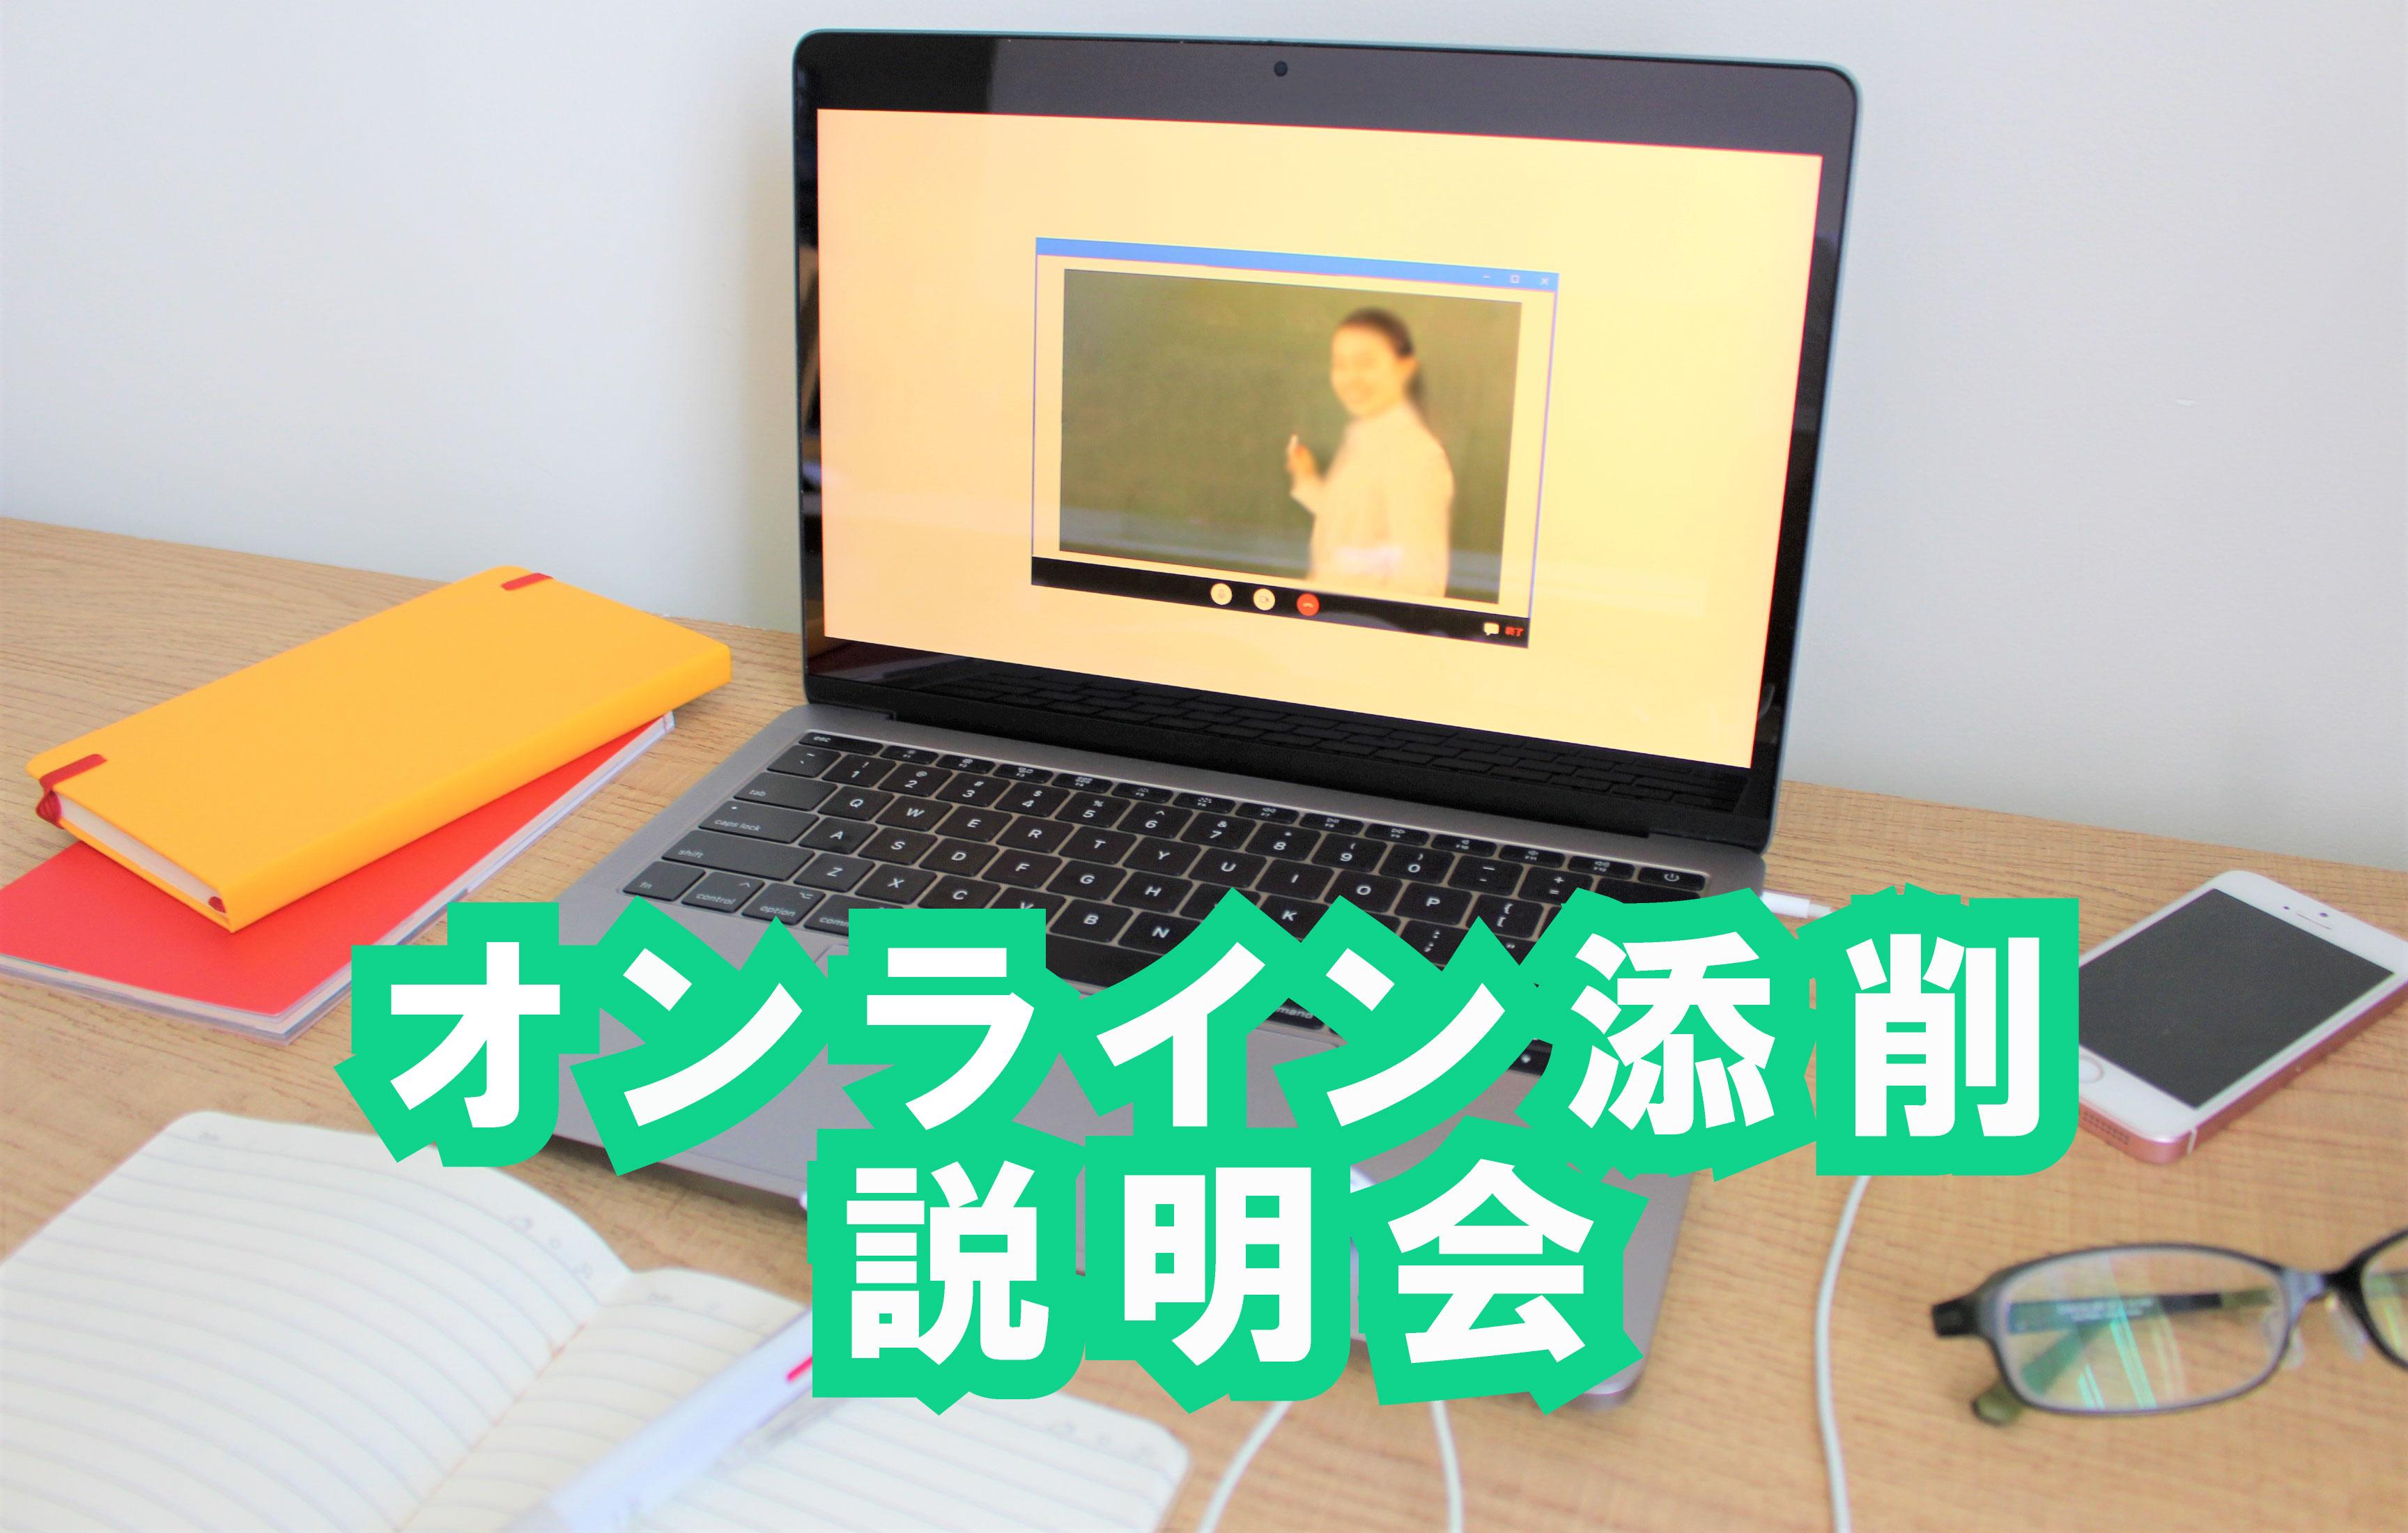 http://www.e-taishin.com/event/common/img/online.information.jpg